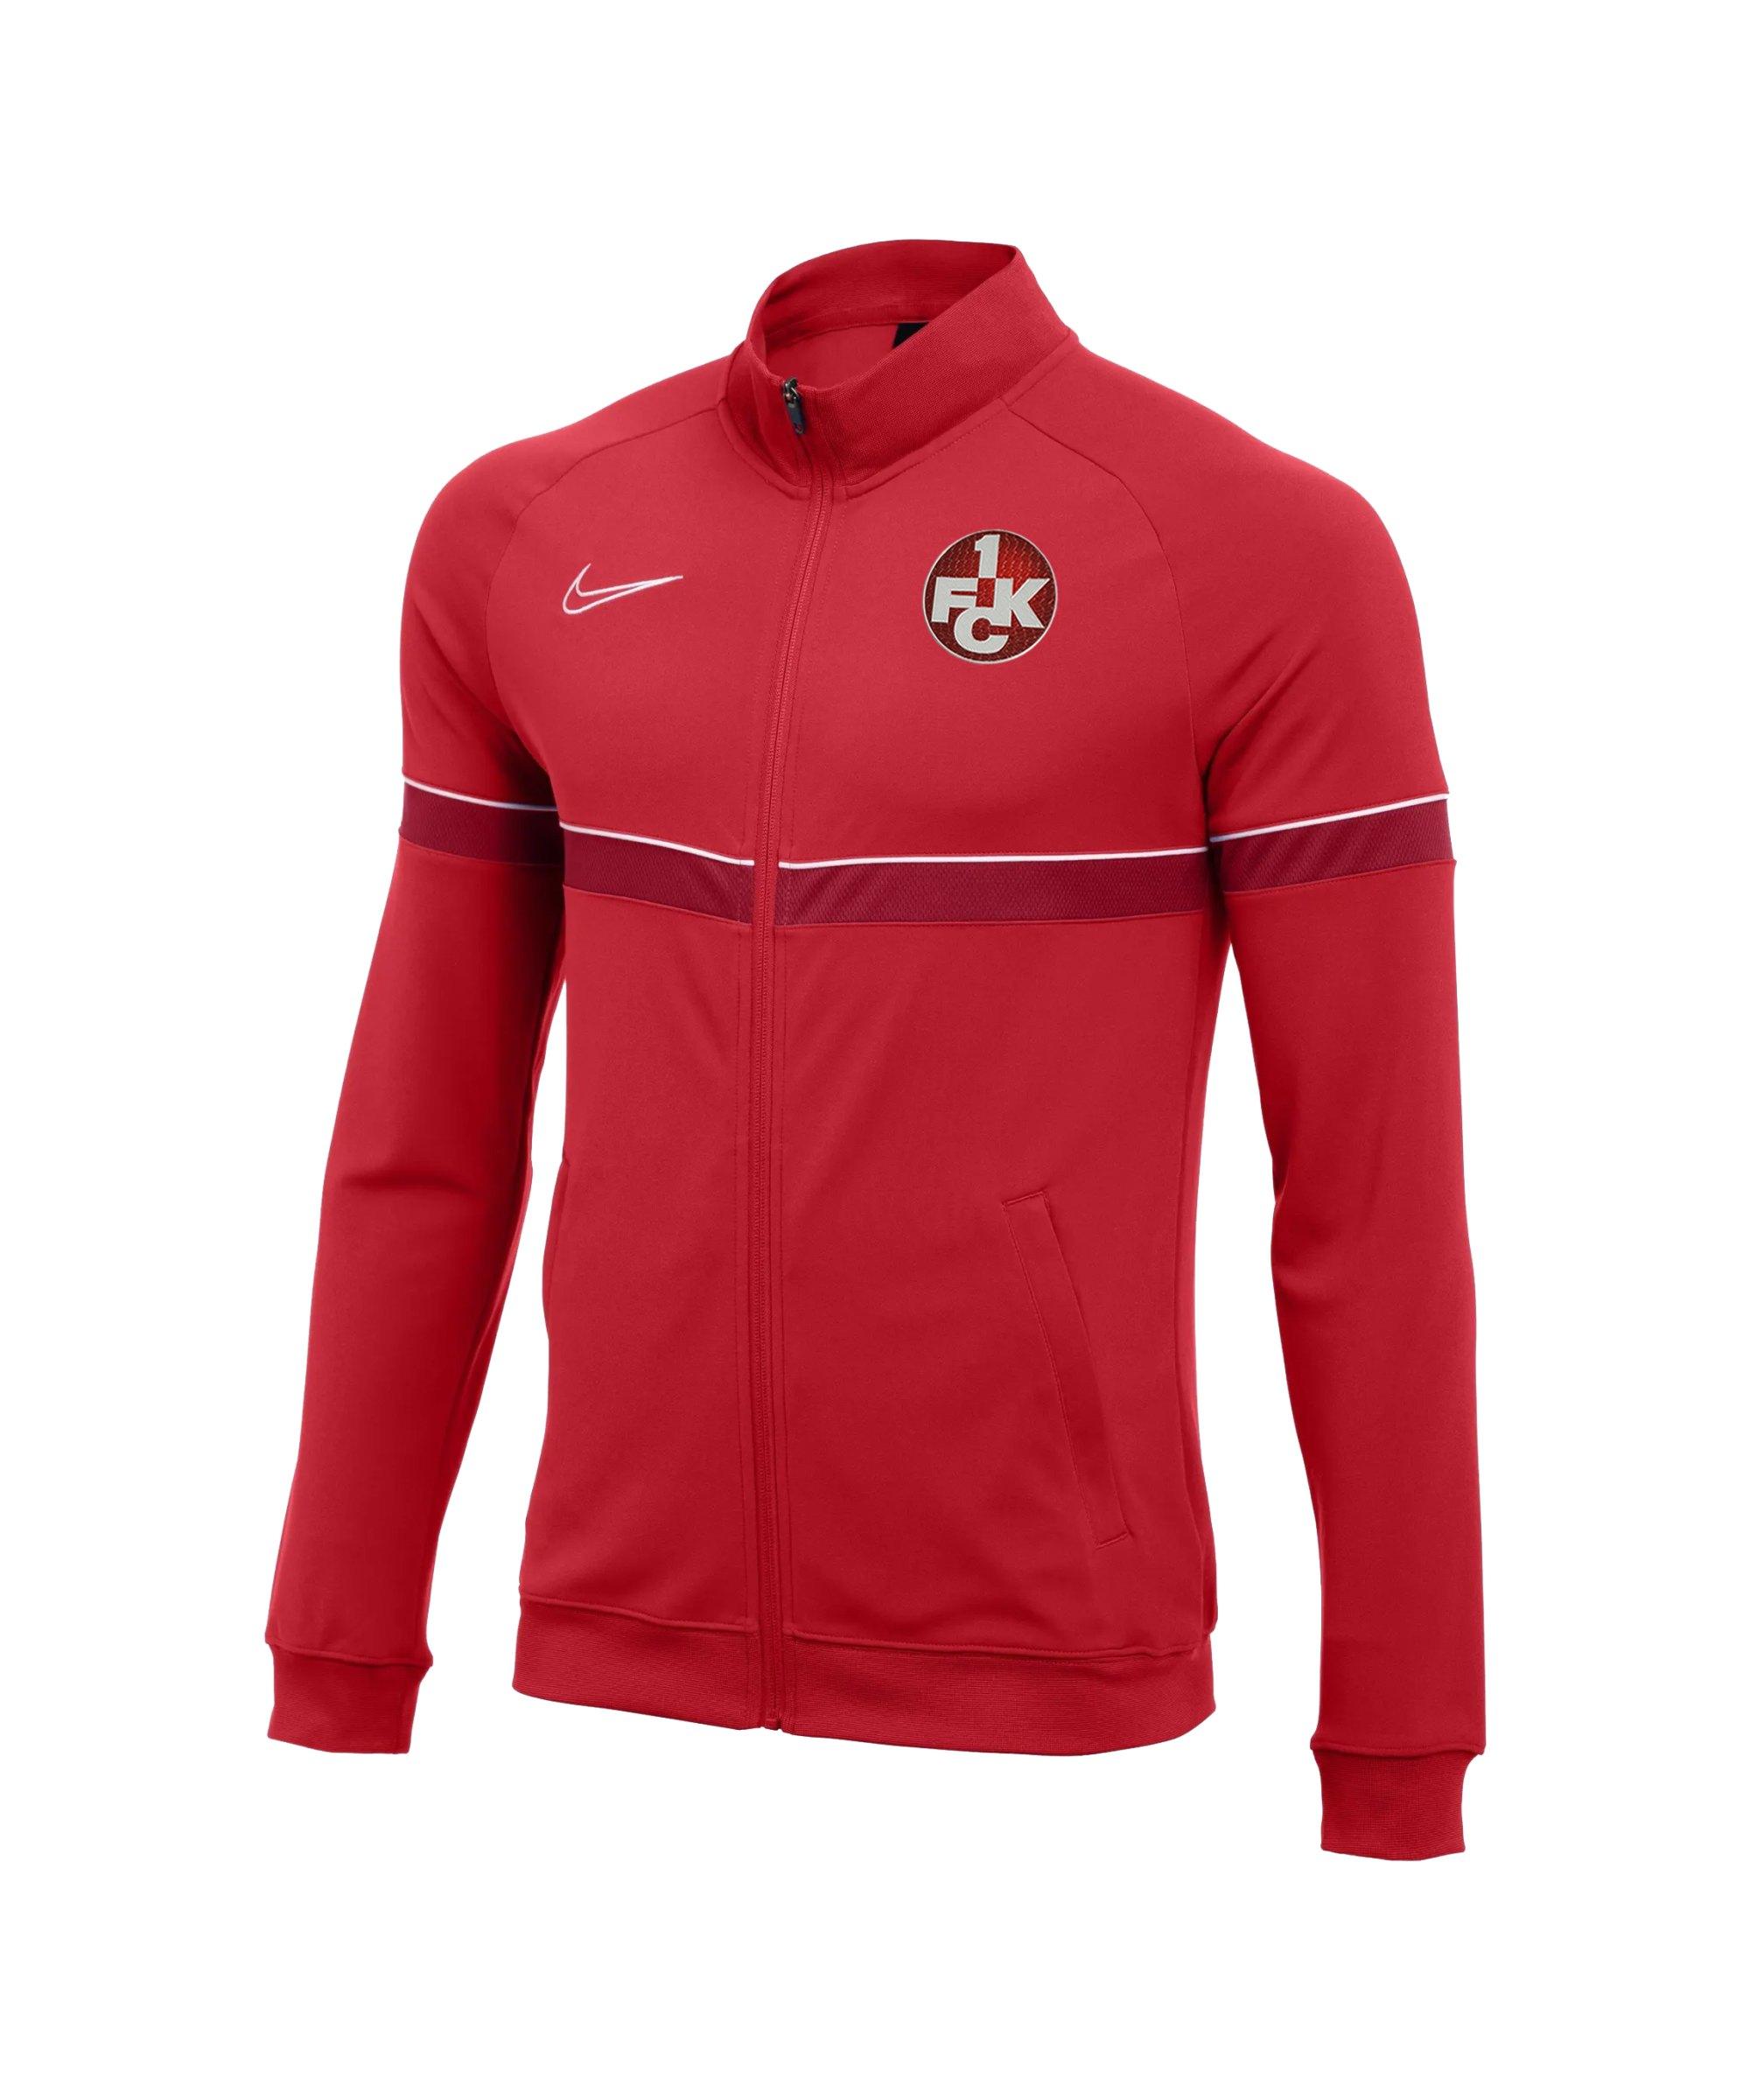 Nike 1. FC Kaiserslautern Trainingsjacke Rot F657 - rot